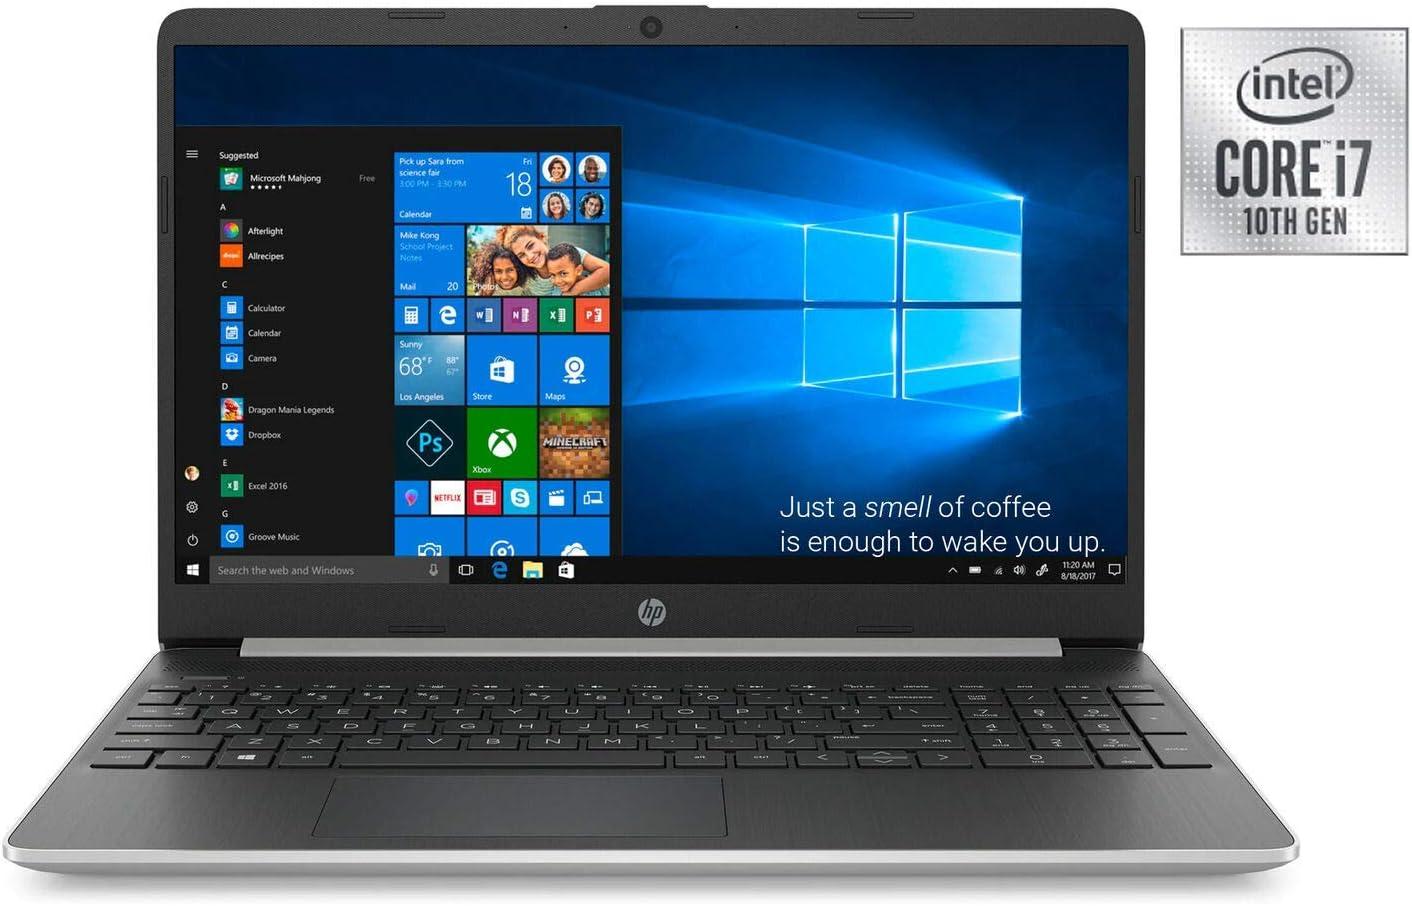 HP 15t Laptop PC 15.6 Inch HD WLED 256GB SSD + 16GB Intel Optane Laptop (i7-1065G7, 8GB RAM, Iris Plus Graphics, Windows 10 Home, Silver) 15-dy1071wm (Renewed)